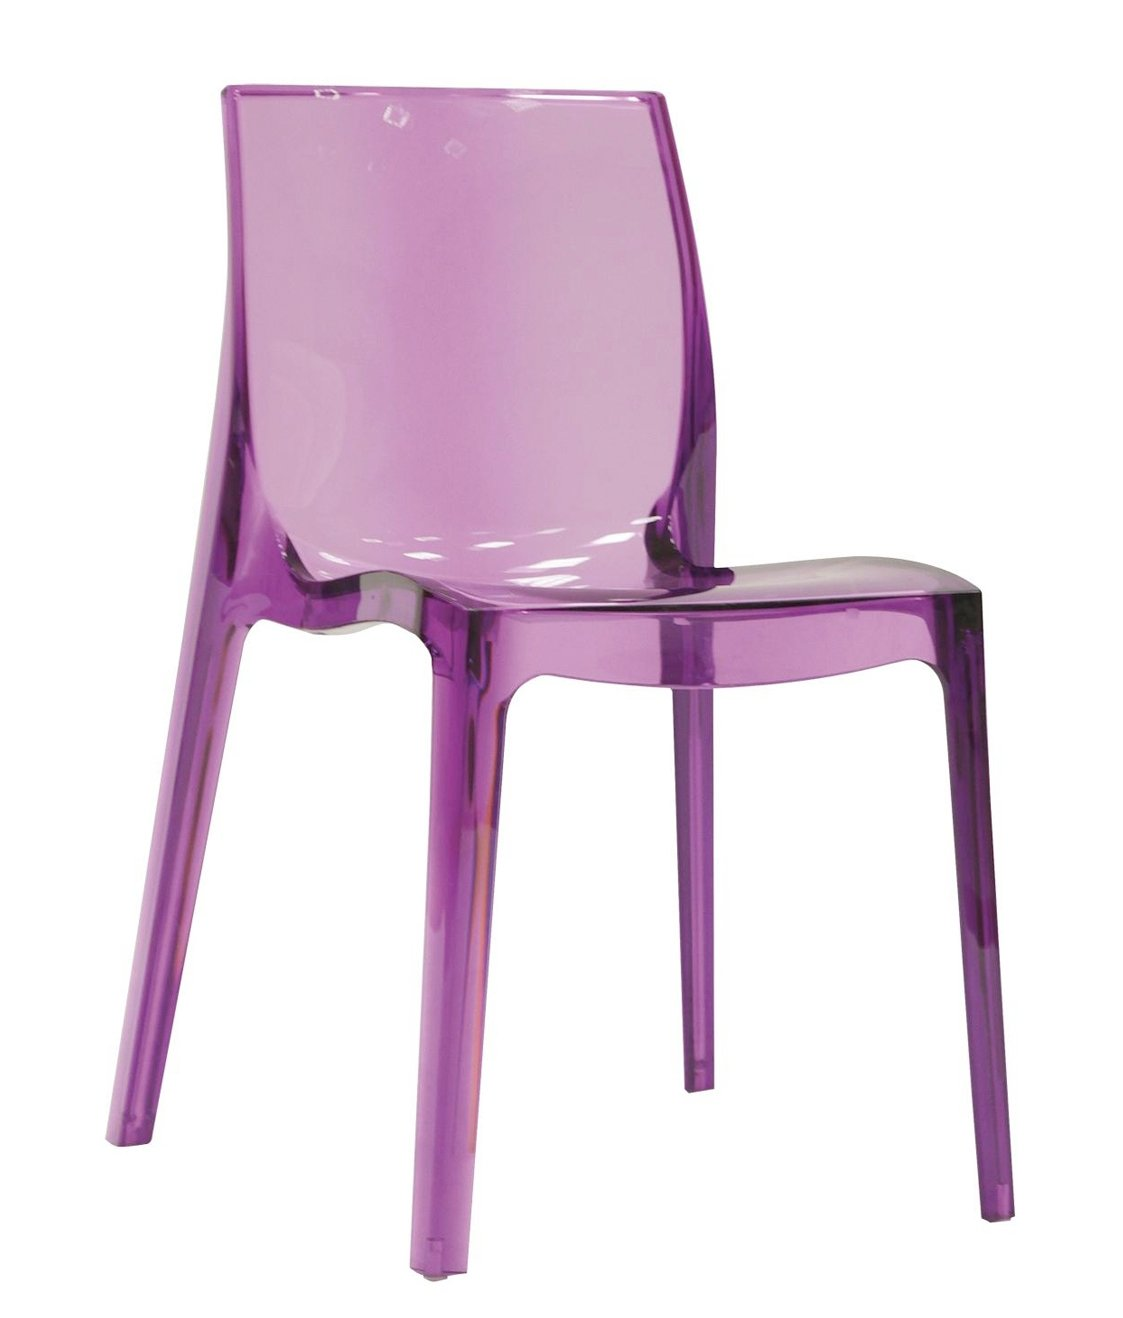 Sedie Plastica Trasparente Ikea.Sedie Low Cost 15 Modelli A Meno Di 100 Euro Cose Di Casa